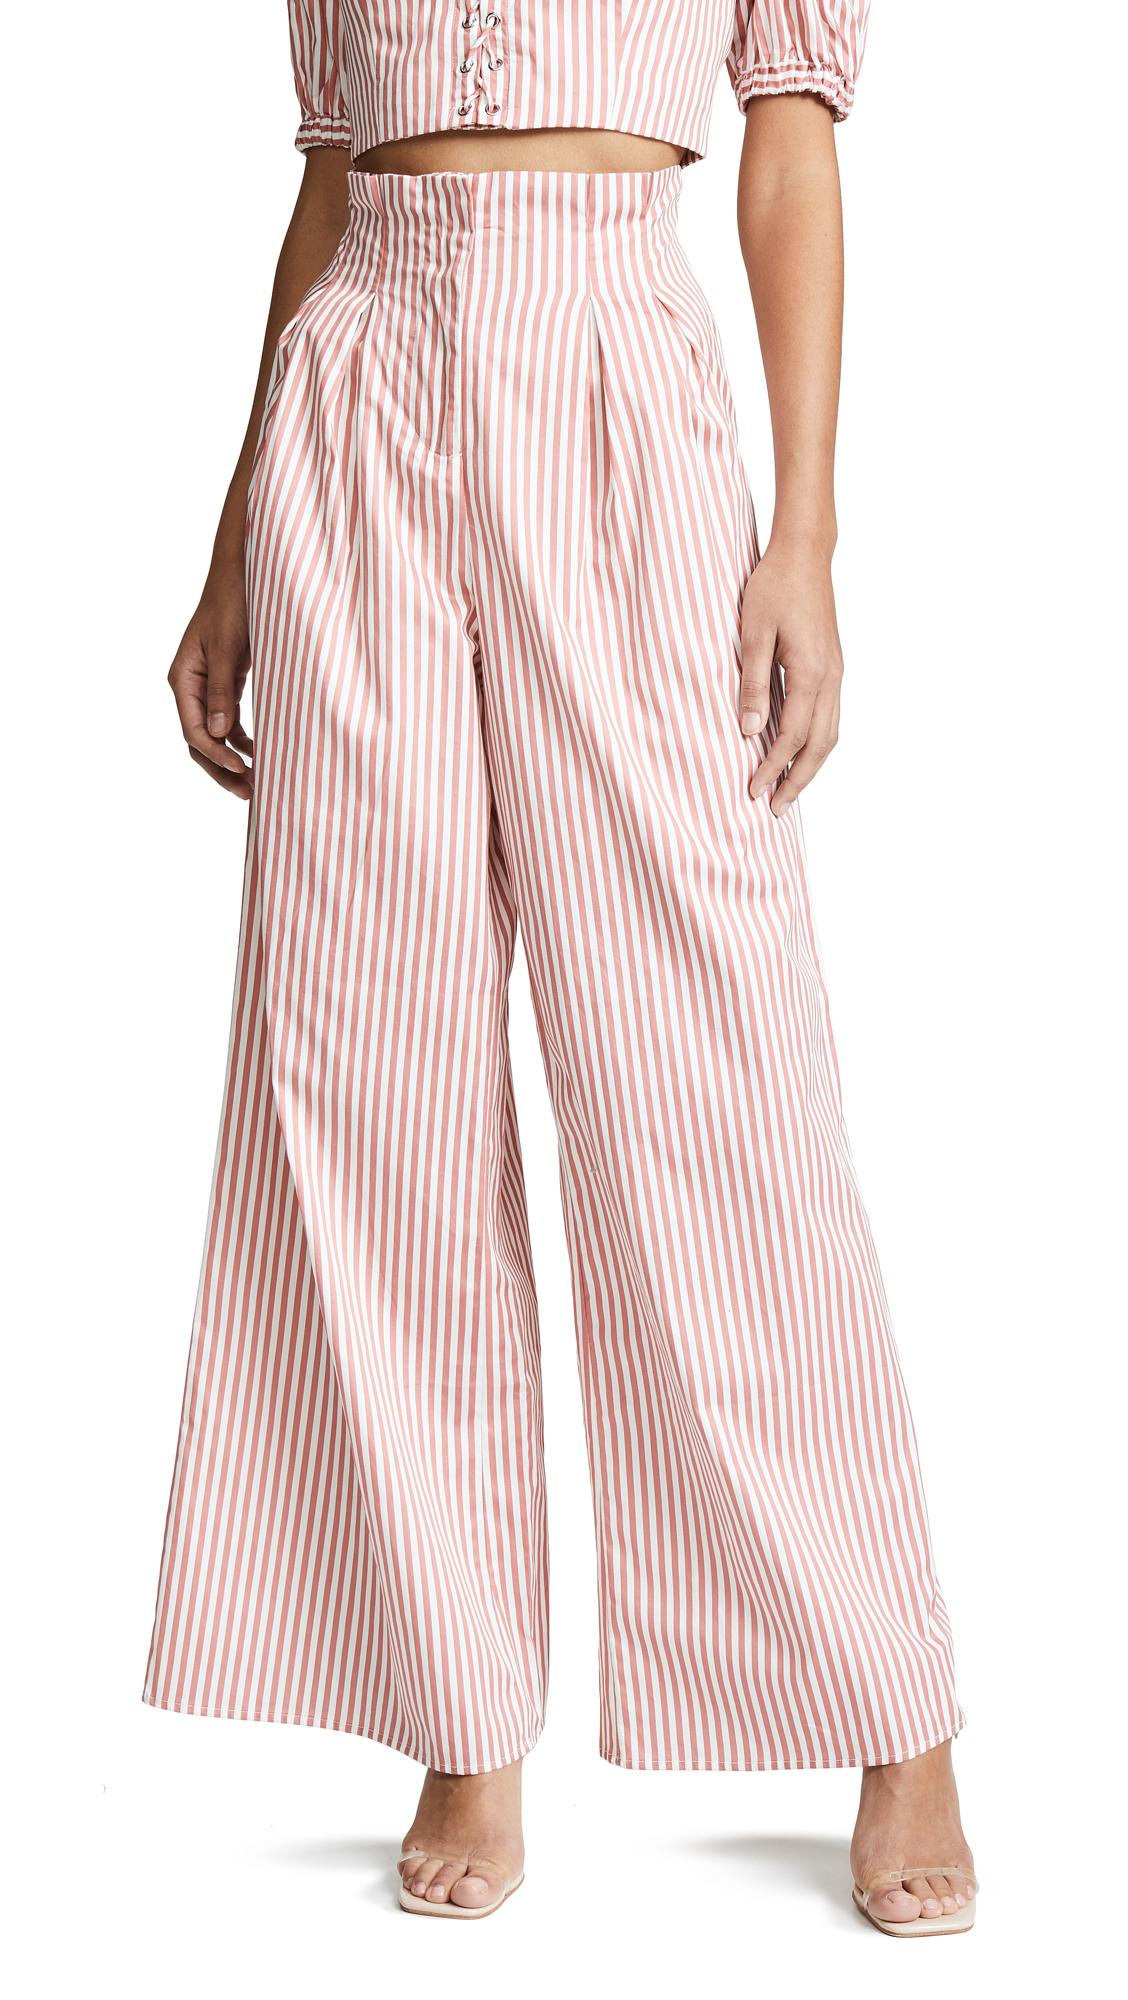 STEELE Marmont Pants in Cinnamon Stripe